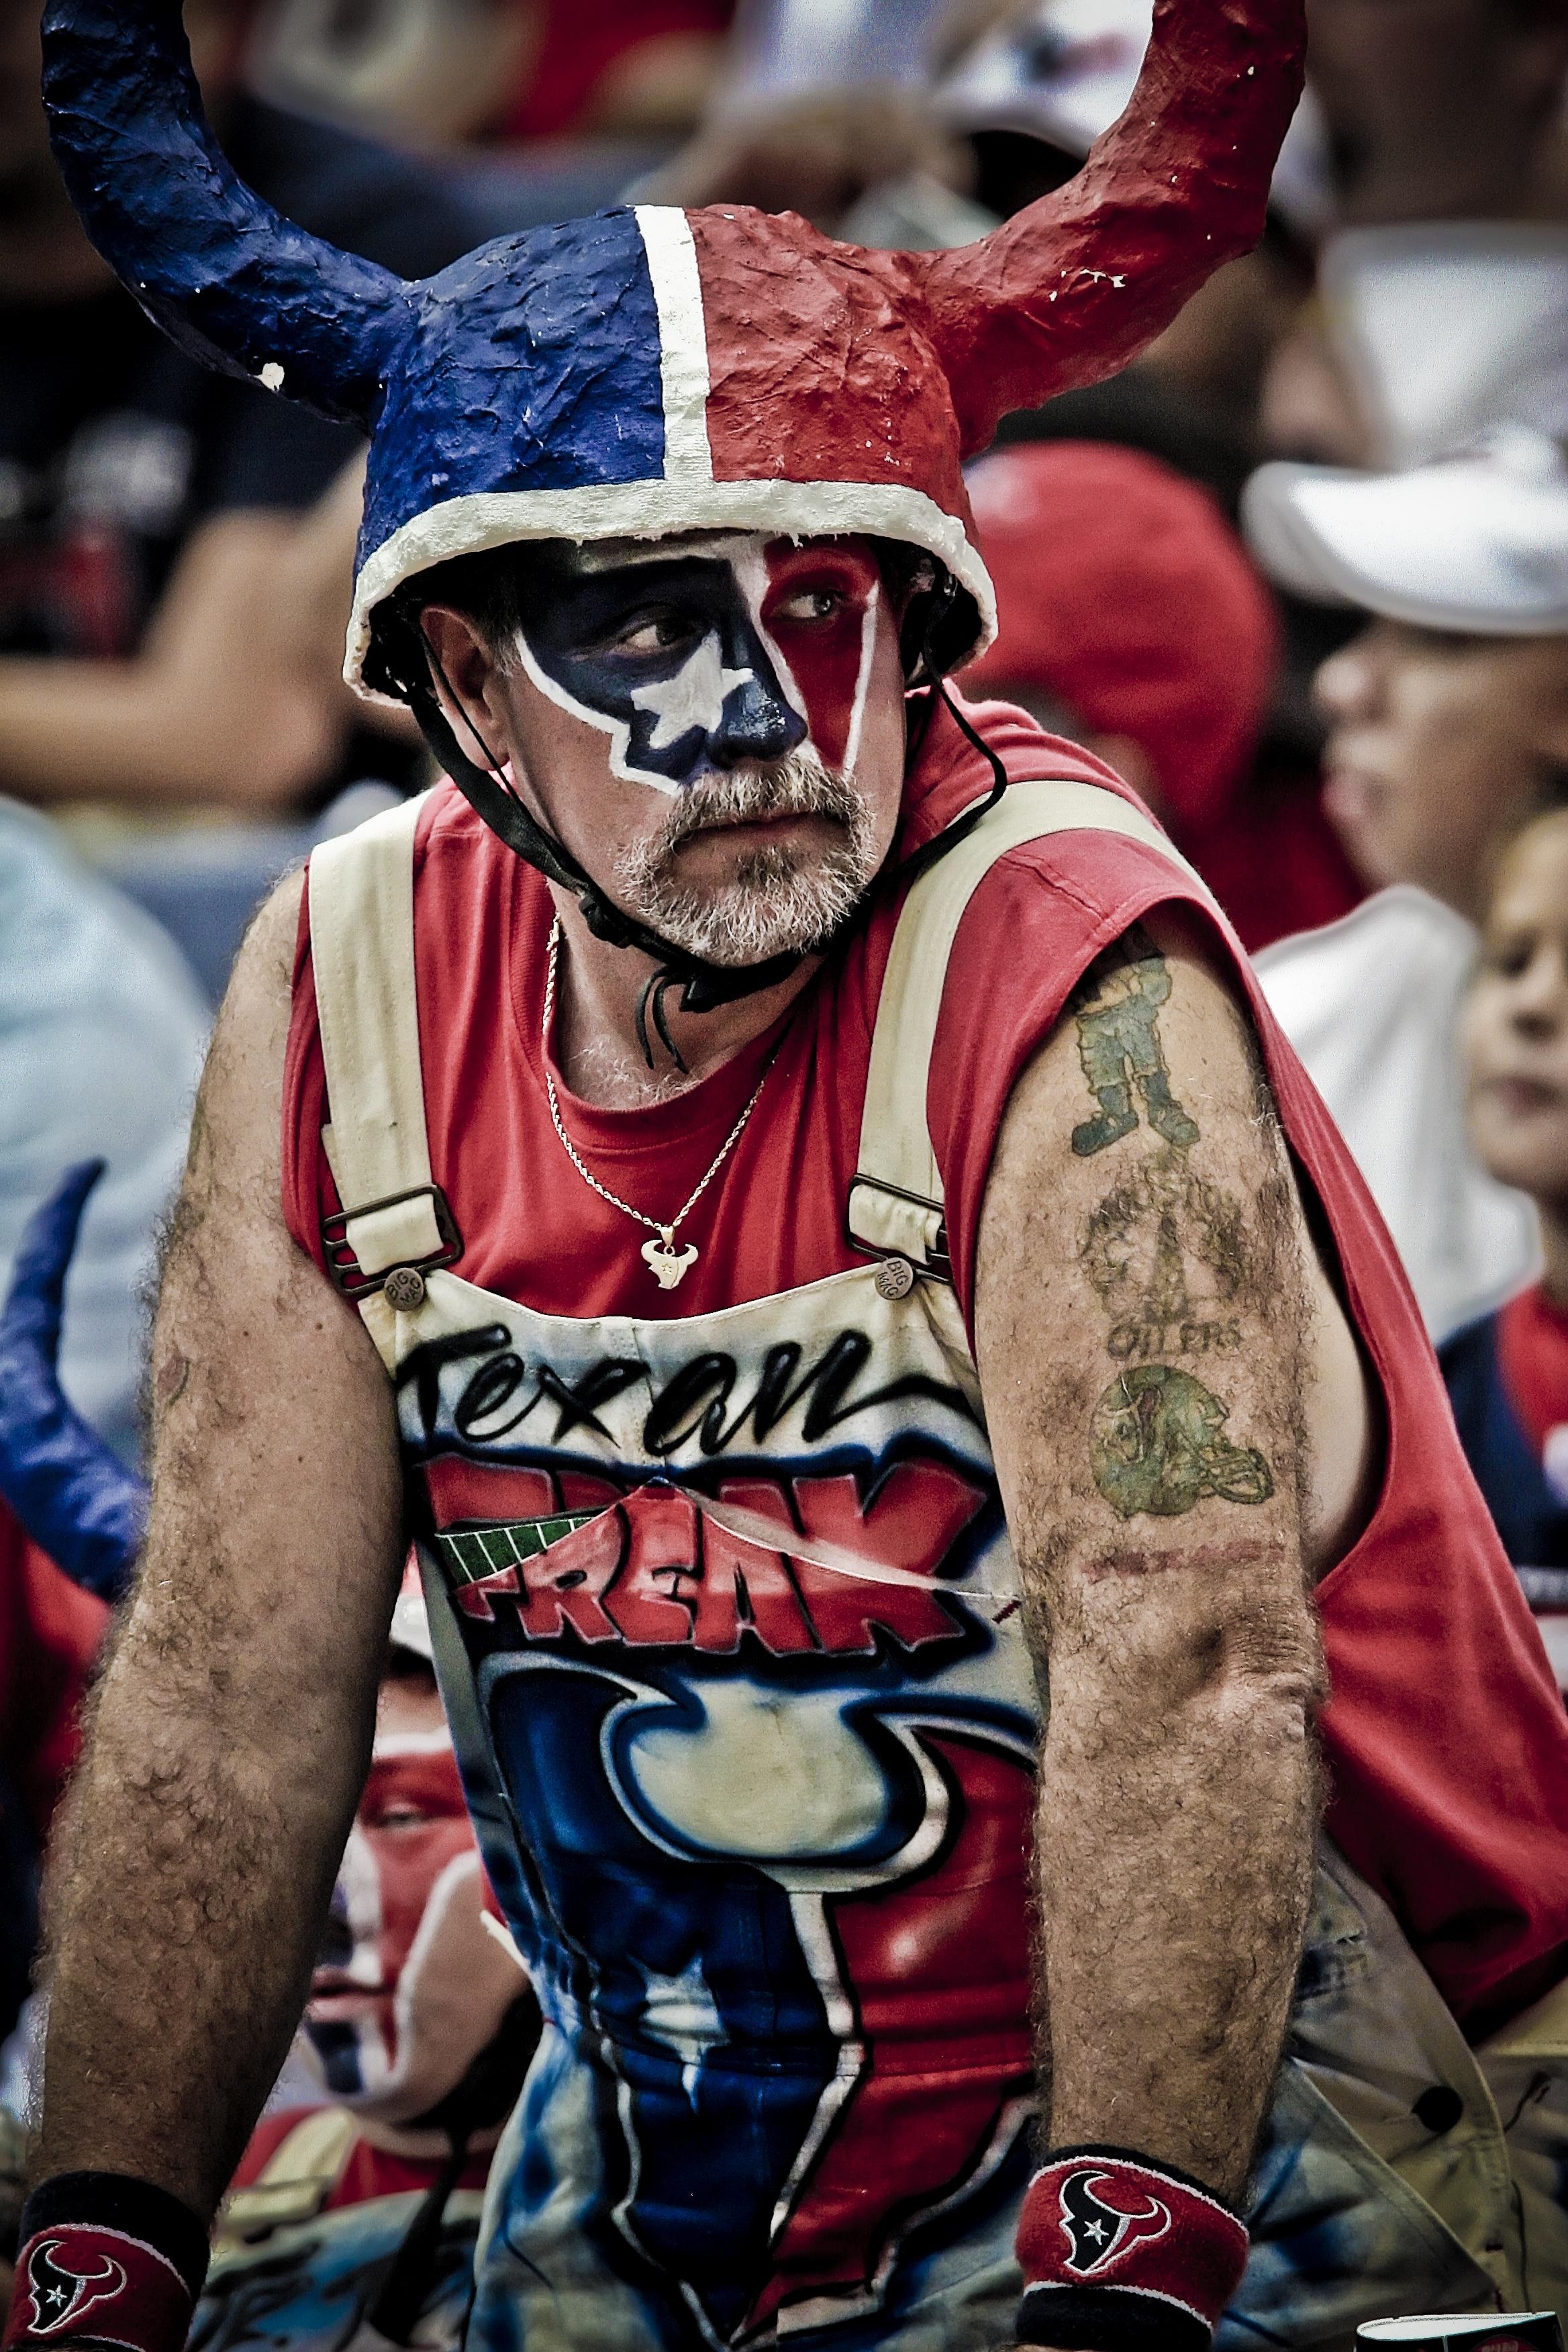 Gambar Pria Merah Penonton Pakaian Sepak Bola Stadion Ras Kaos Amerika Olahraga Festival Tim Dilukis Texas Karakter Kostum Tanduk